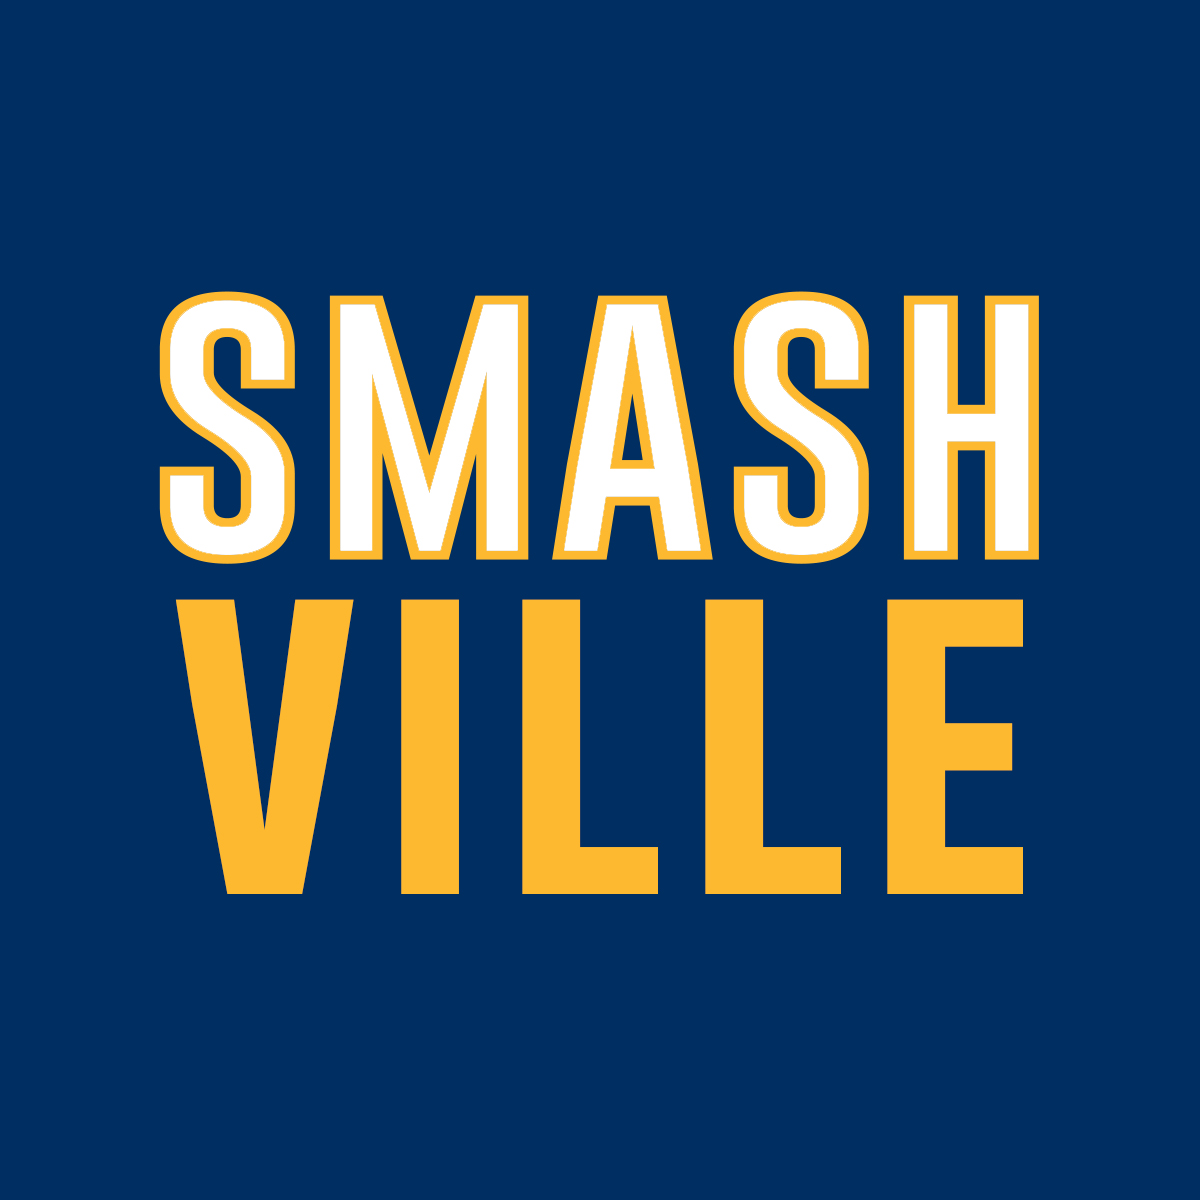 https://i2.wp.com/jackalopebrew.com/wp-content/uploads/2019/01/Smashville.jpg?fit=1200%2C1200&ssl=1